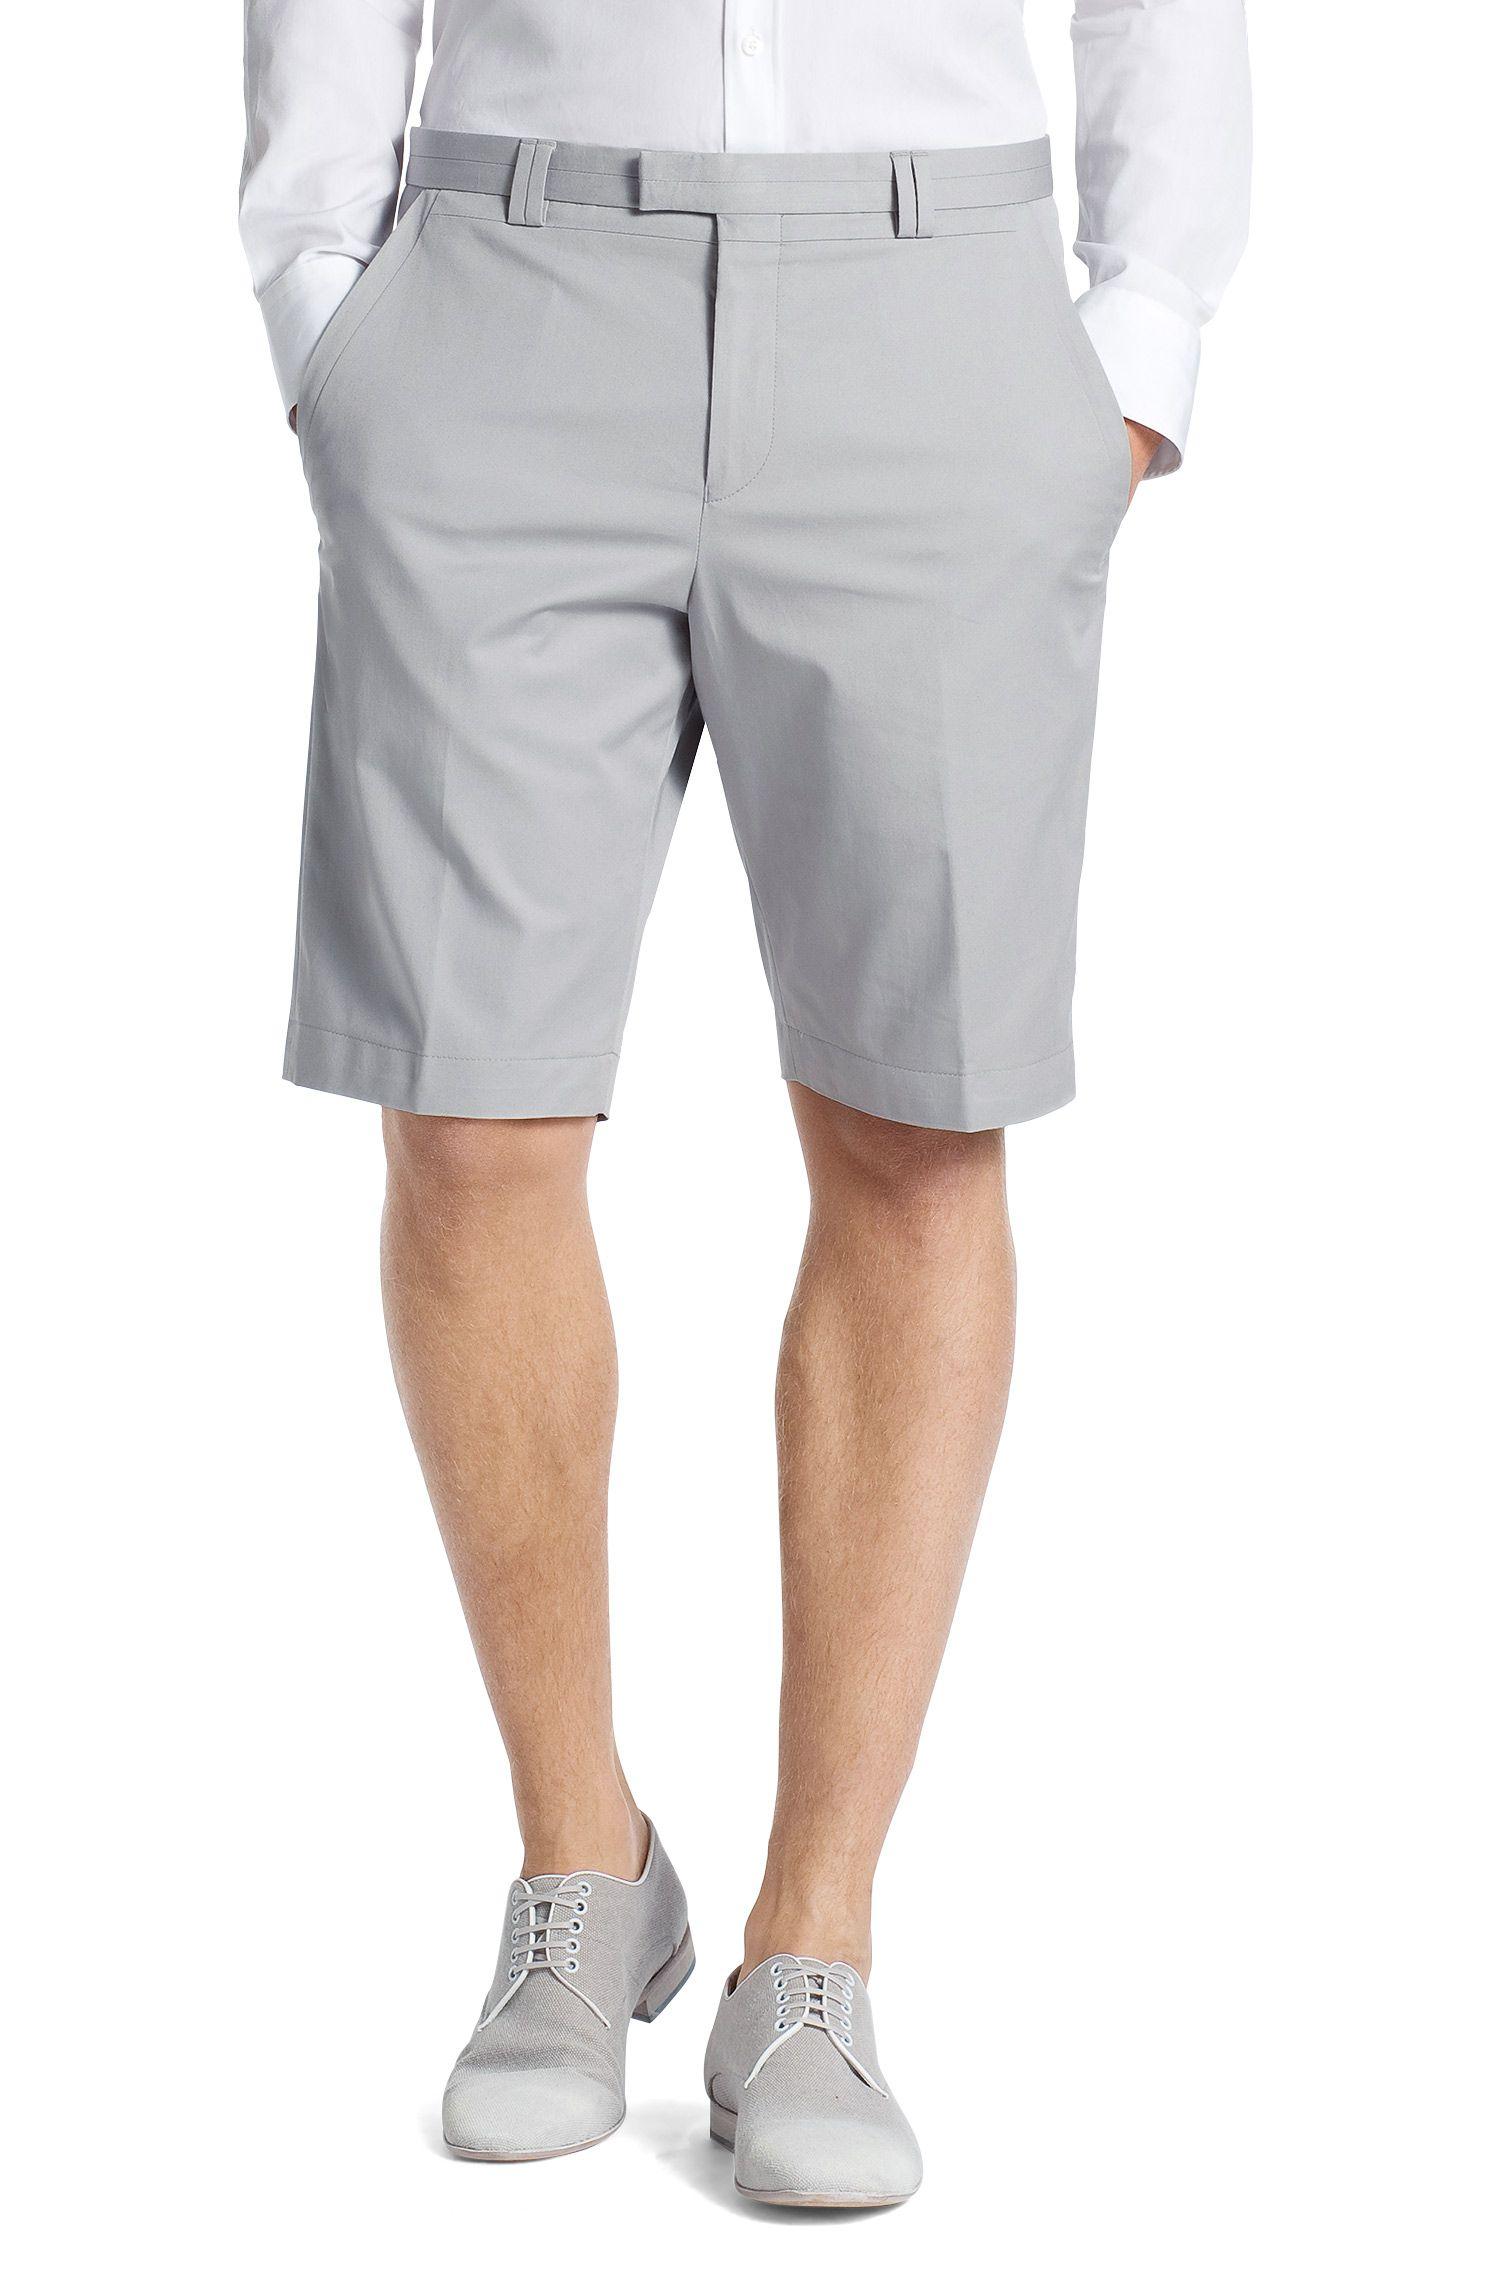 Bermuda-Shorts ´Himmo` aus Baumwoll-Mix